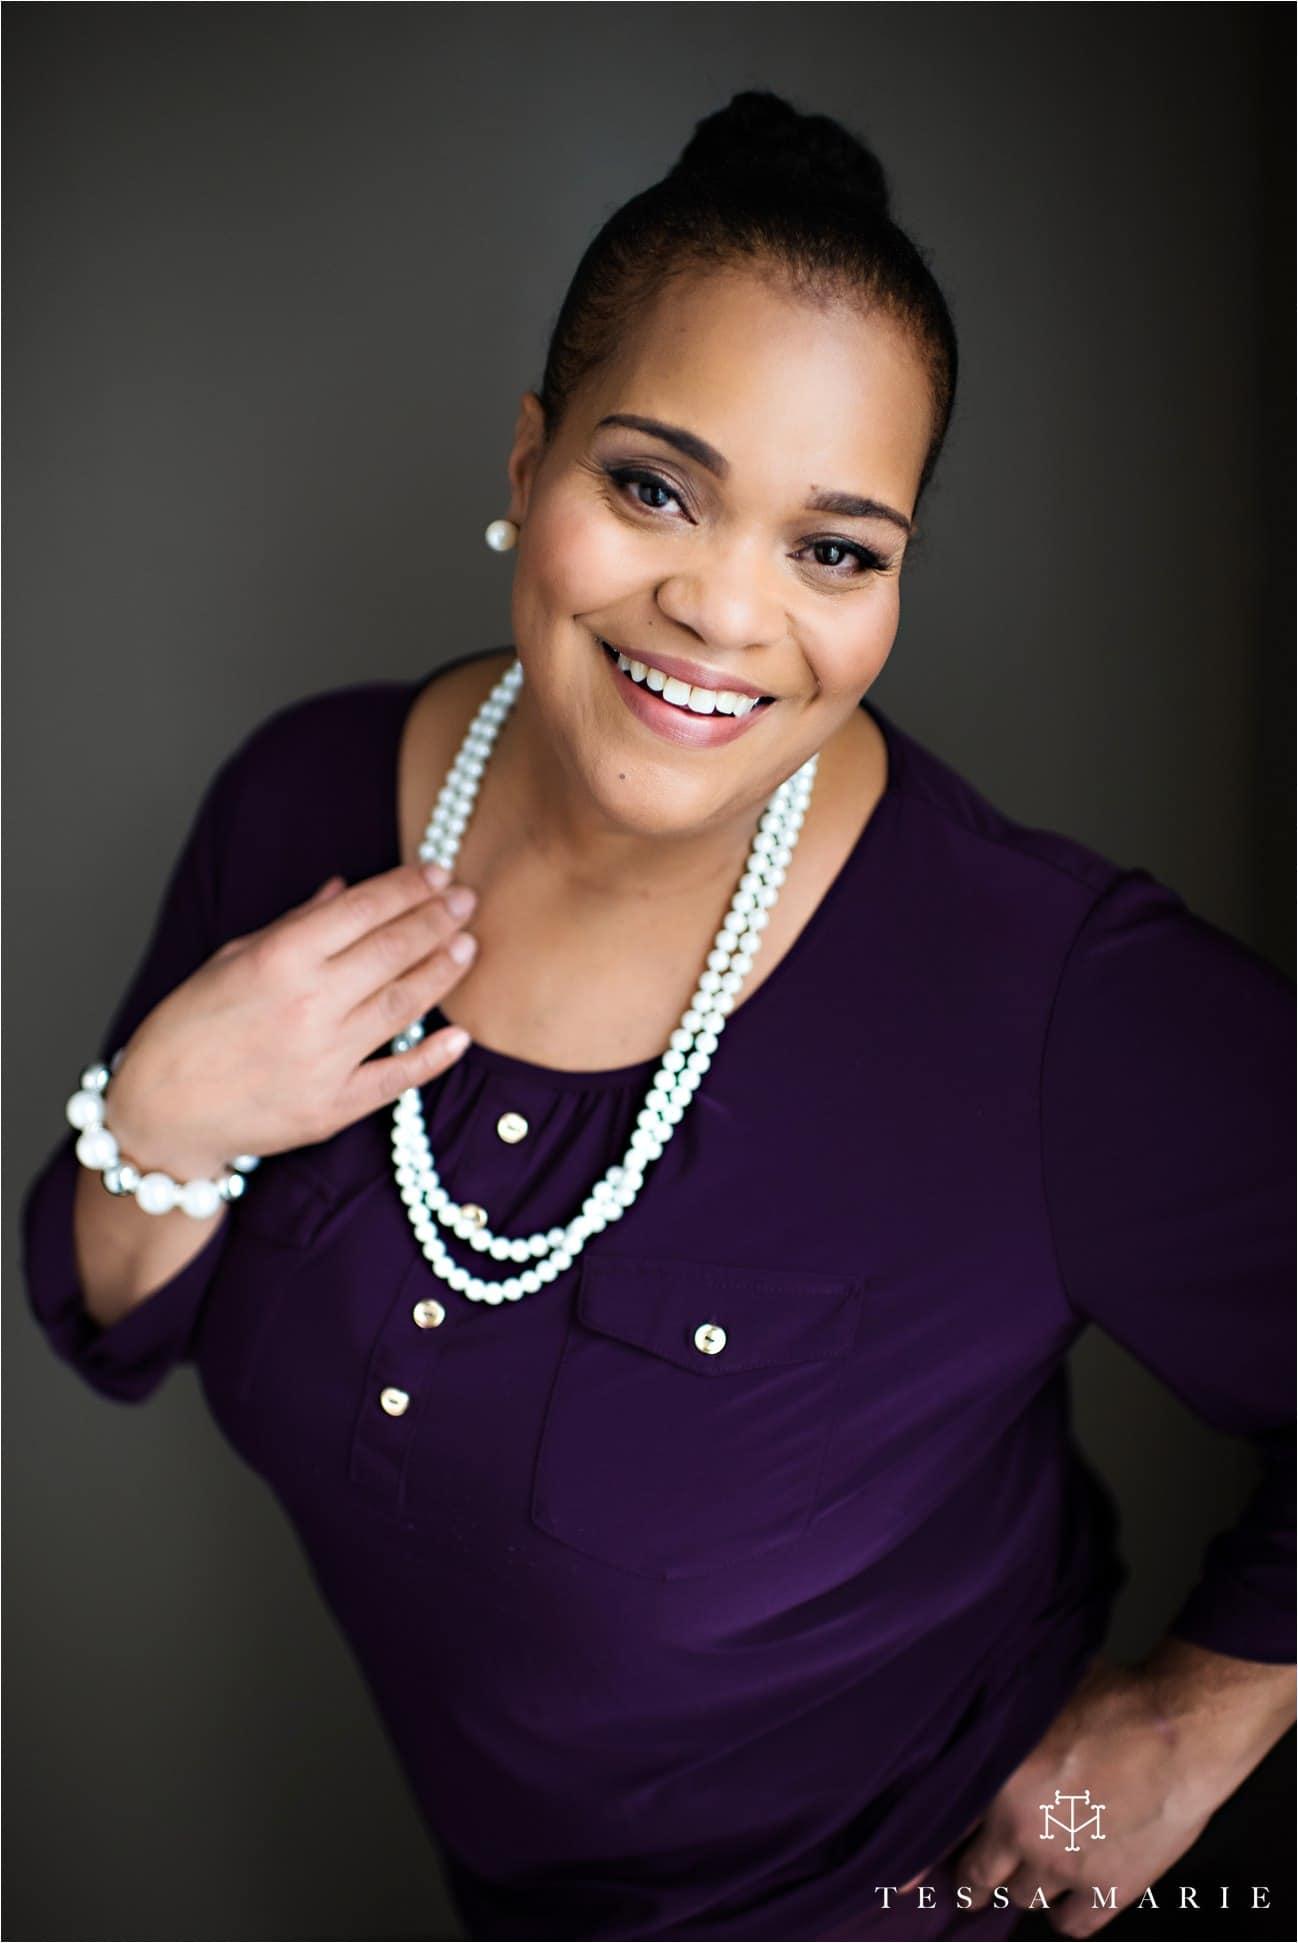 Tessa_marie_studios_womens_headshots_portraits_empowering_full_experience_something_for_mom_0046